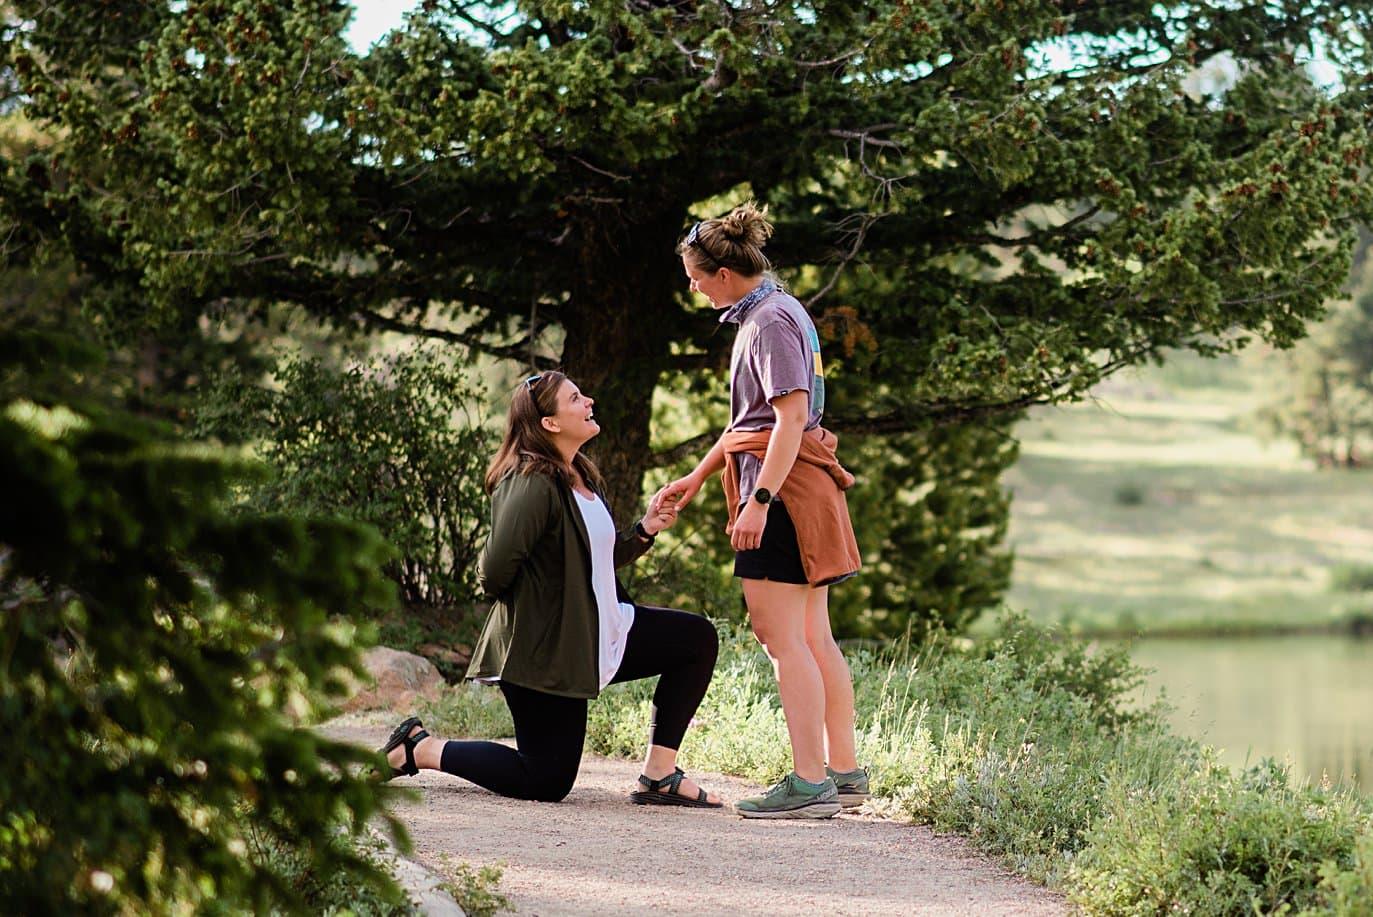 LGBTQ proposal at Estes Park Lily Lake by Estes Park wedding photographer Jennie Crate